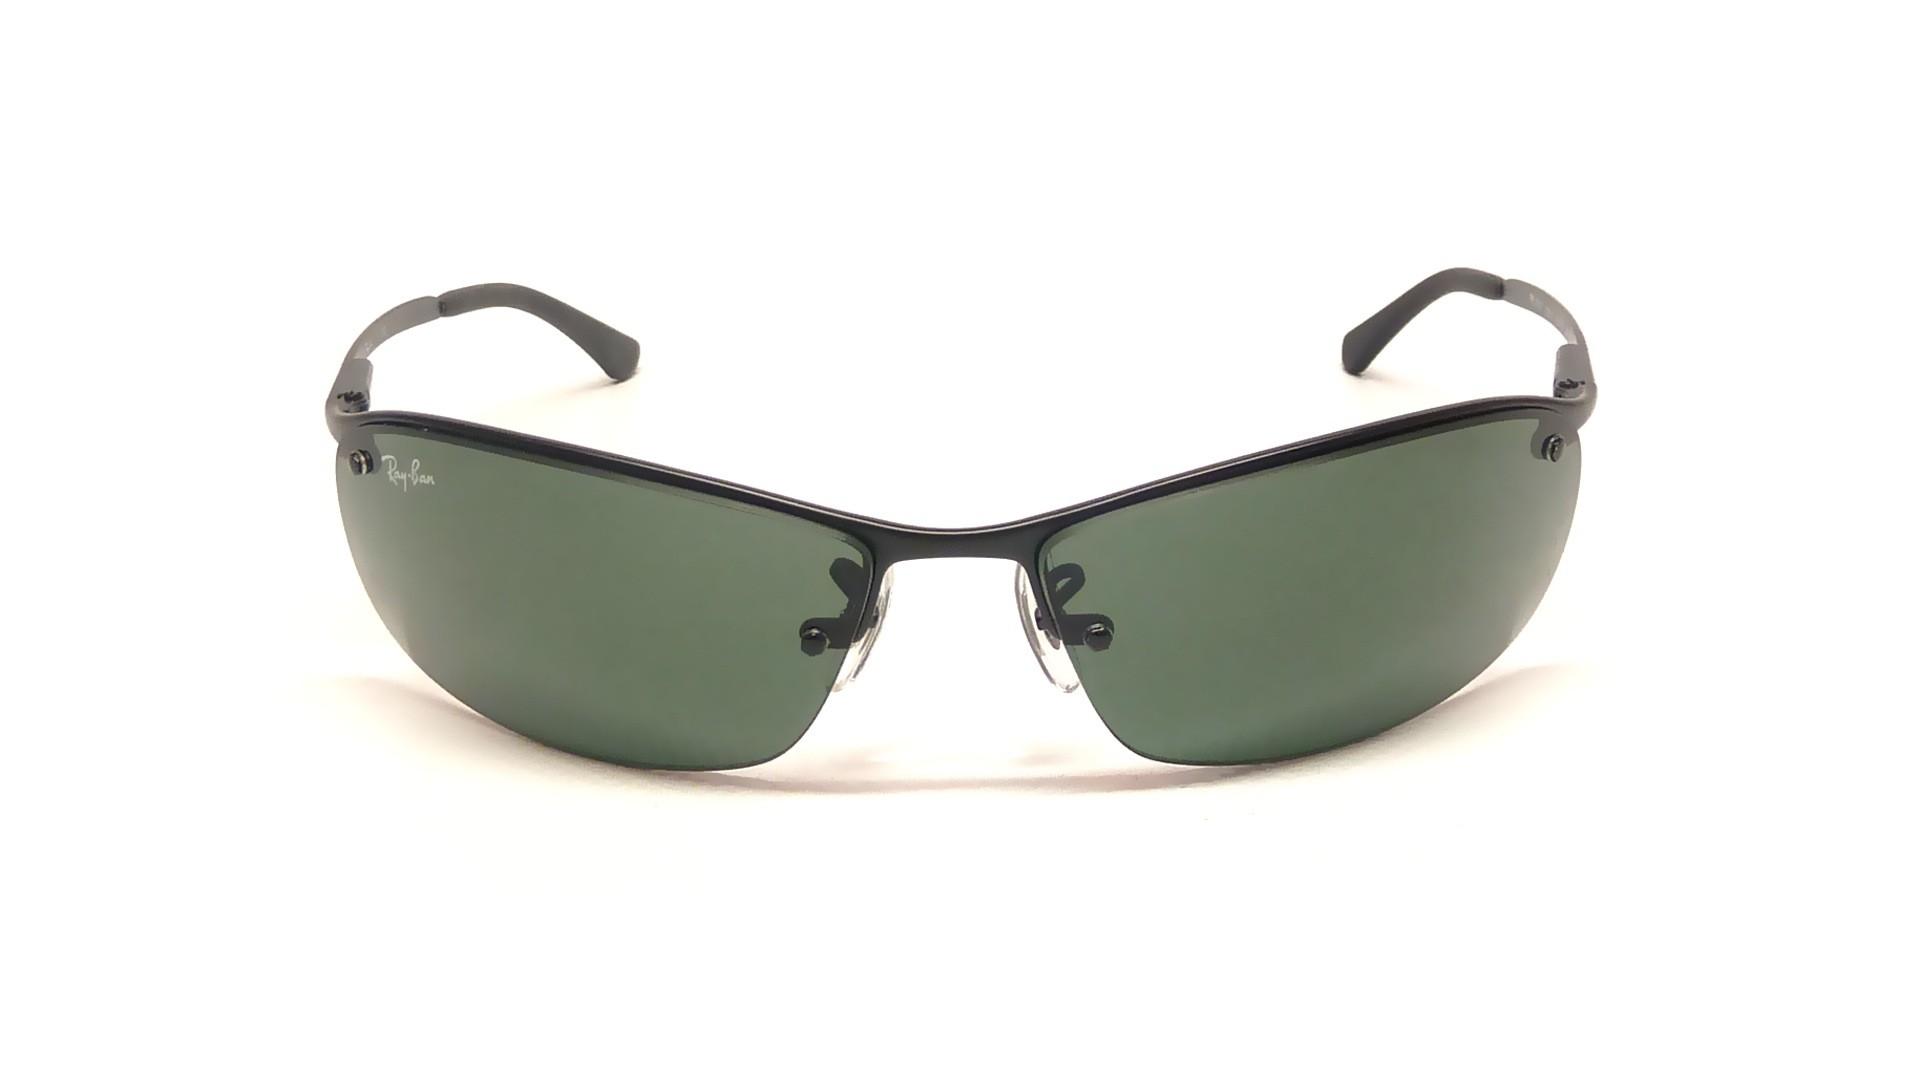 9778e9448a7d9 Sunglasses Ray-Ban RB3183 006 71 63-15 Black Large